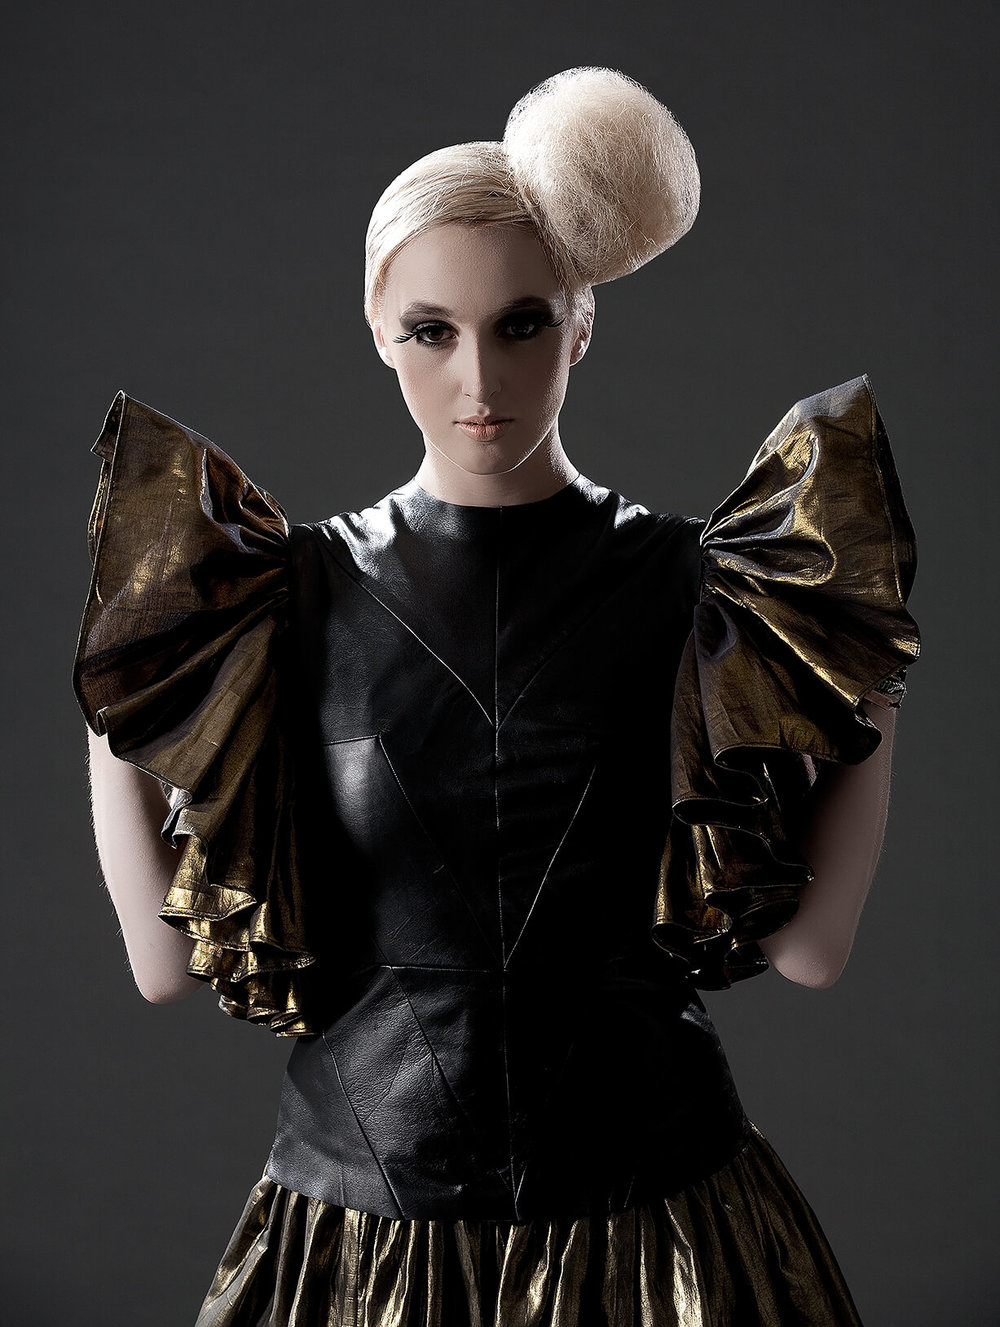 Futuristic fashion photography by Melbourne Photographer Chalk Studio